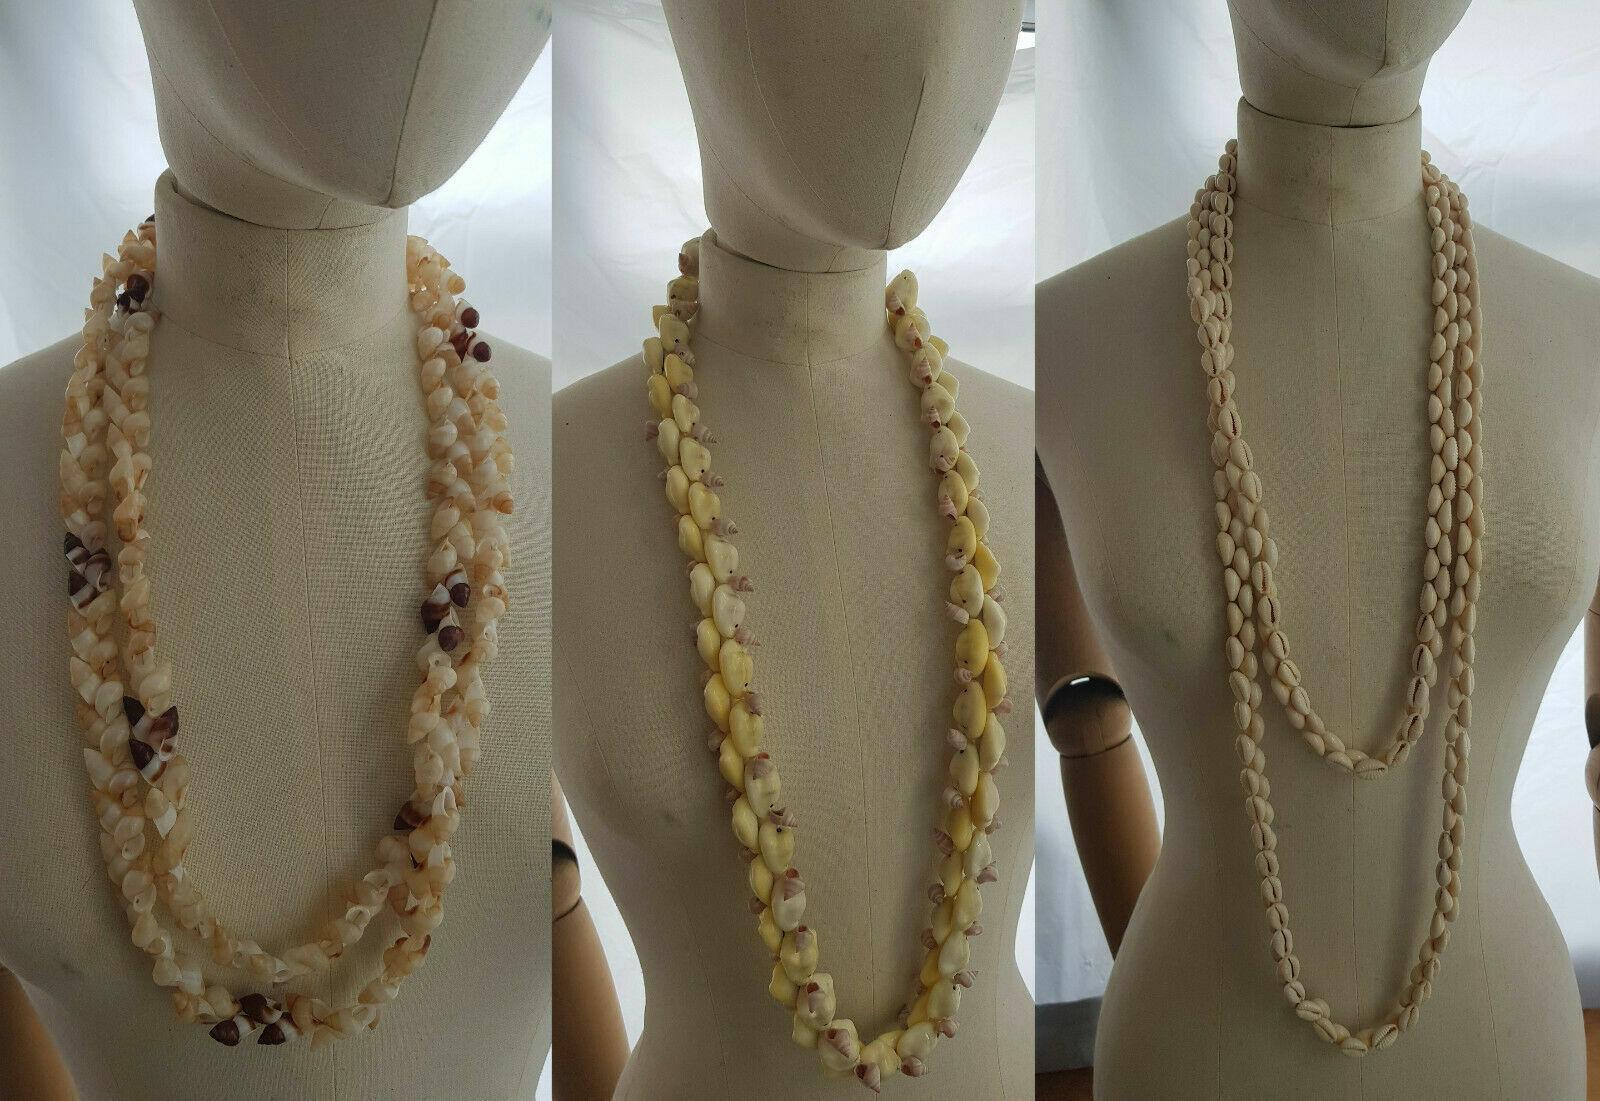 Hawaiian polynesian Shell Jewelry Bridesmaids 3 Necklaces Beach wedding